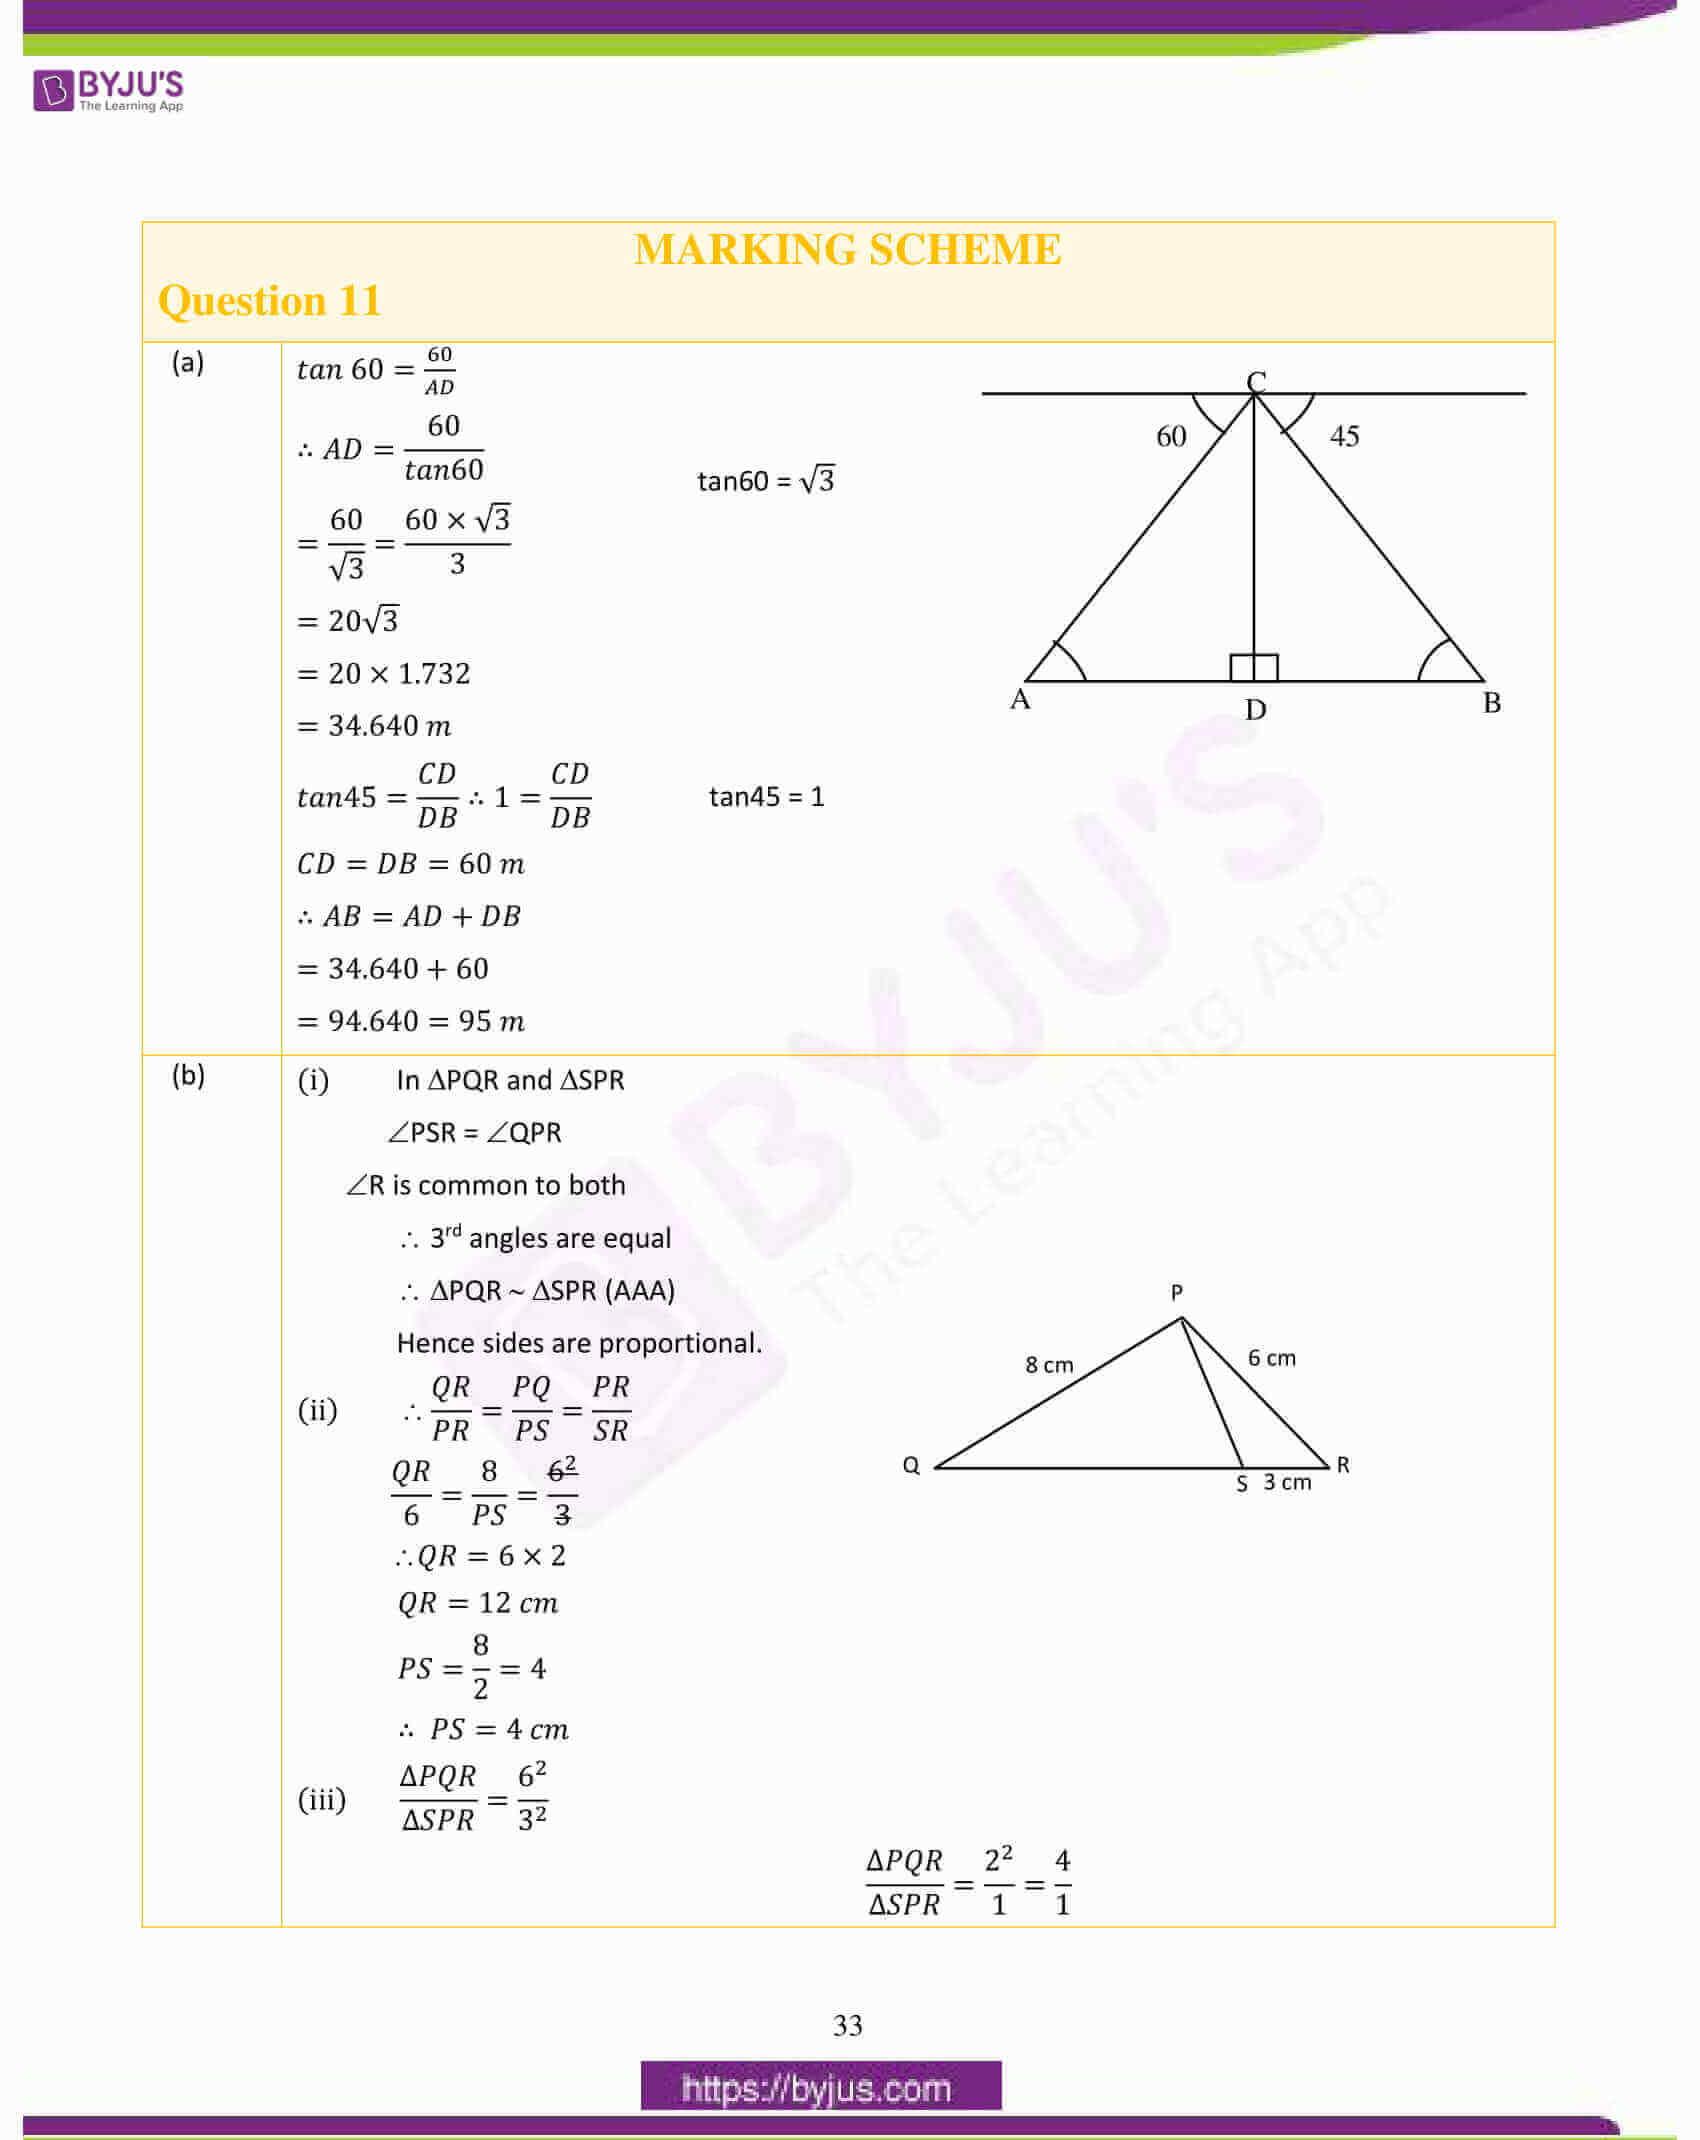 icse class 10 maths question paper solution 2017 24